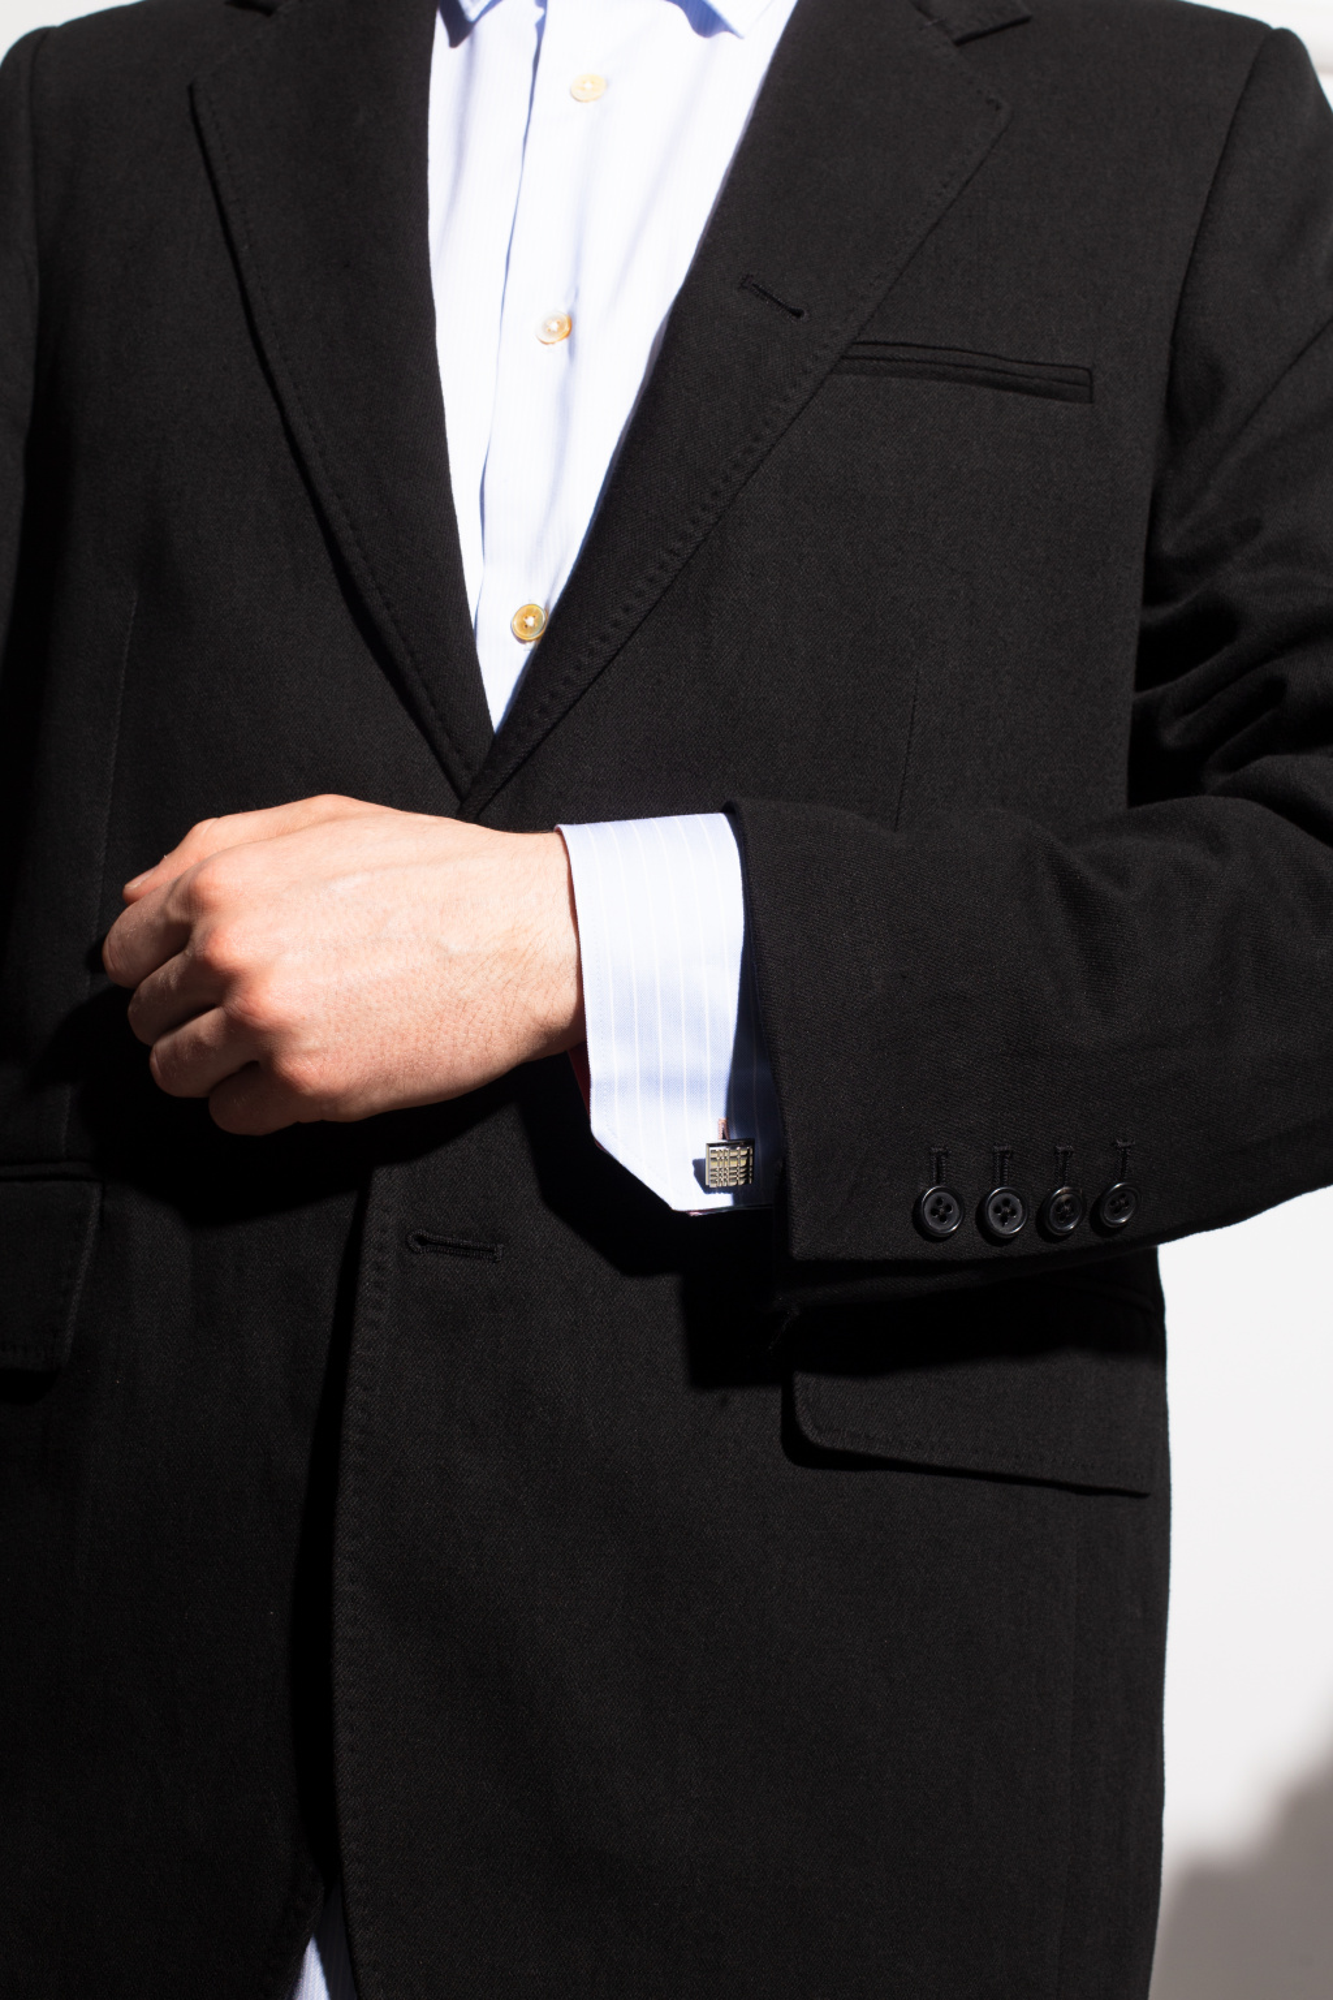 Burberry Embossed cufflinks